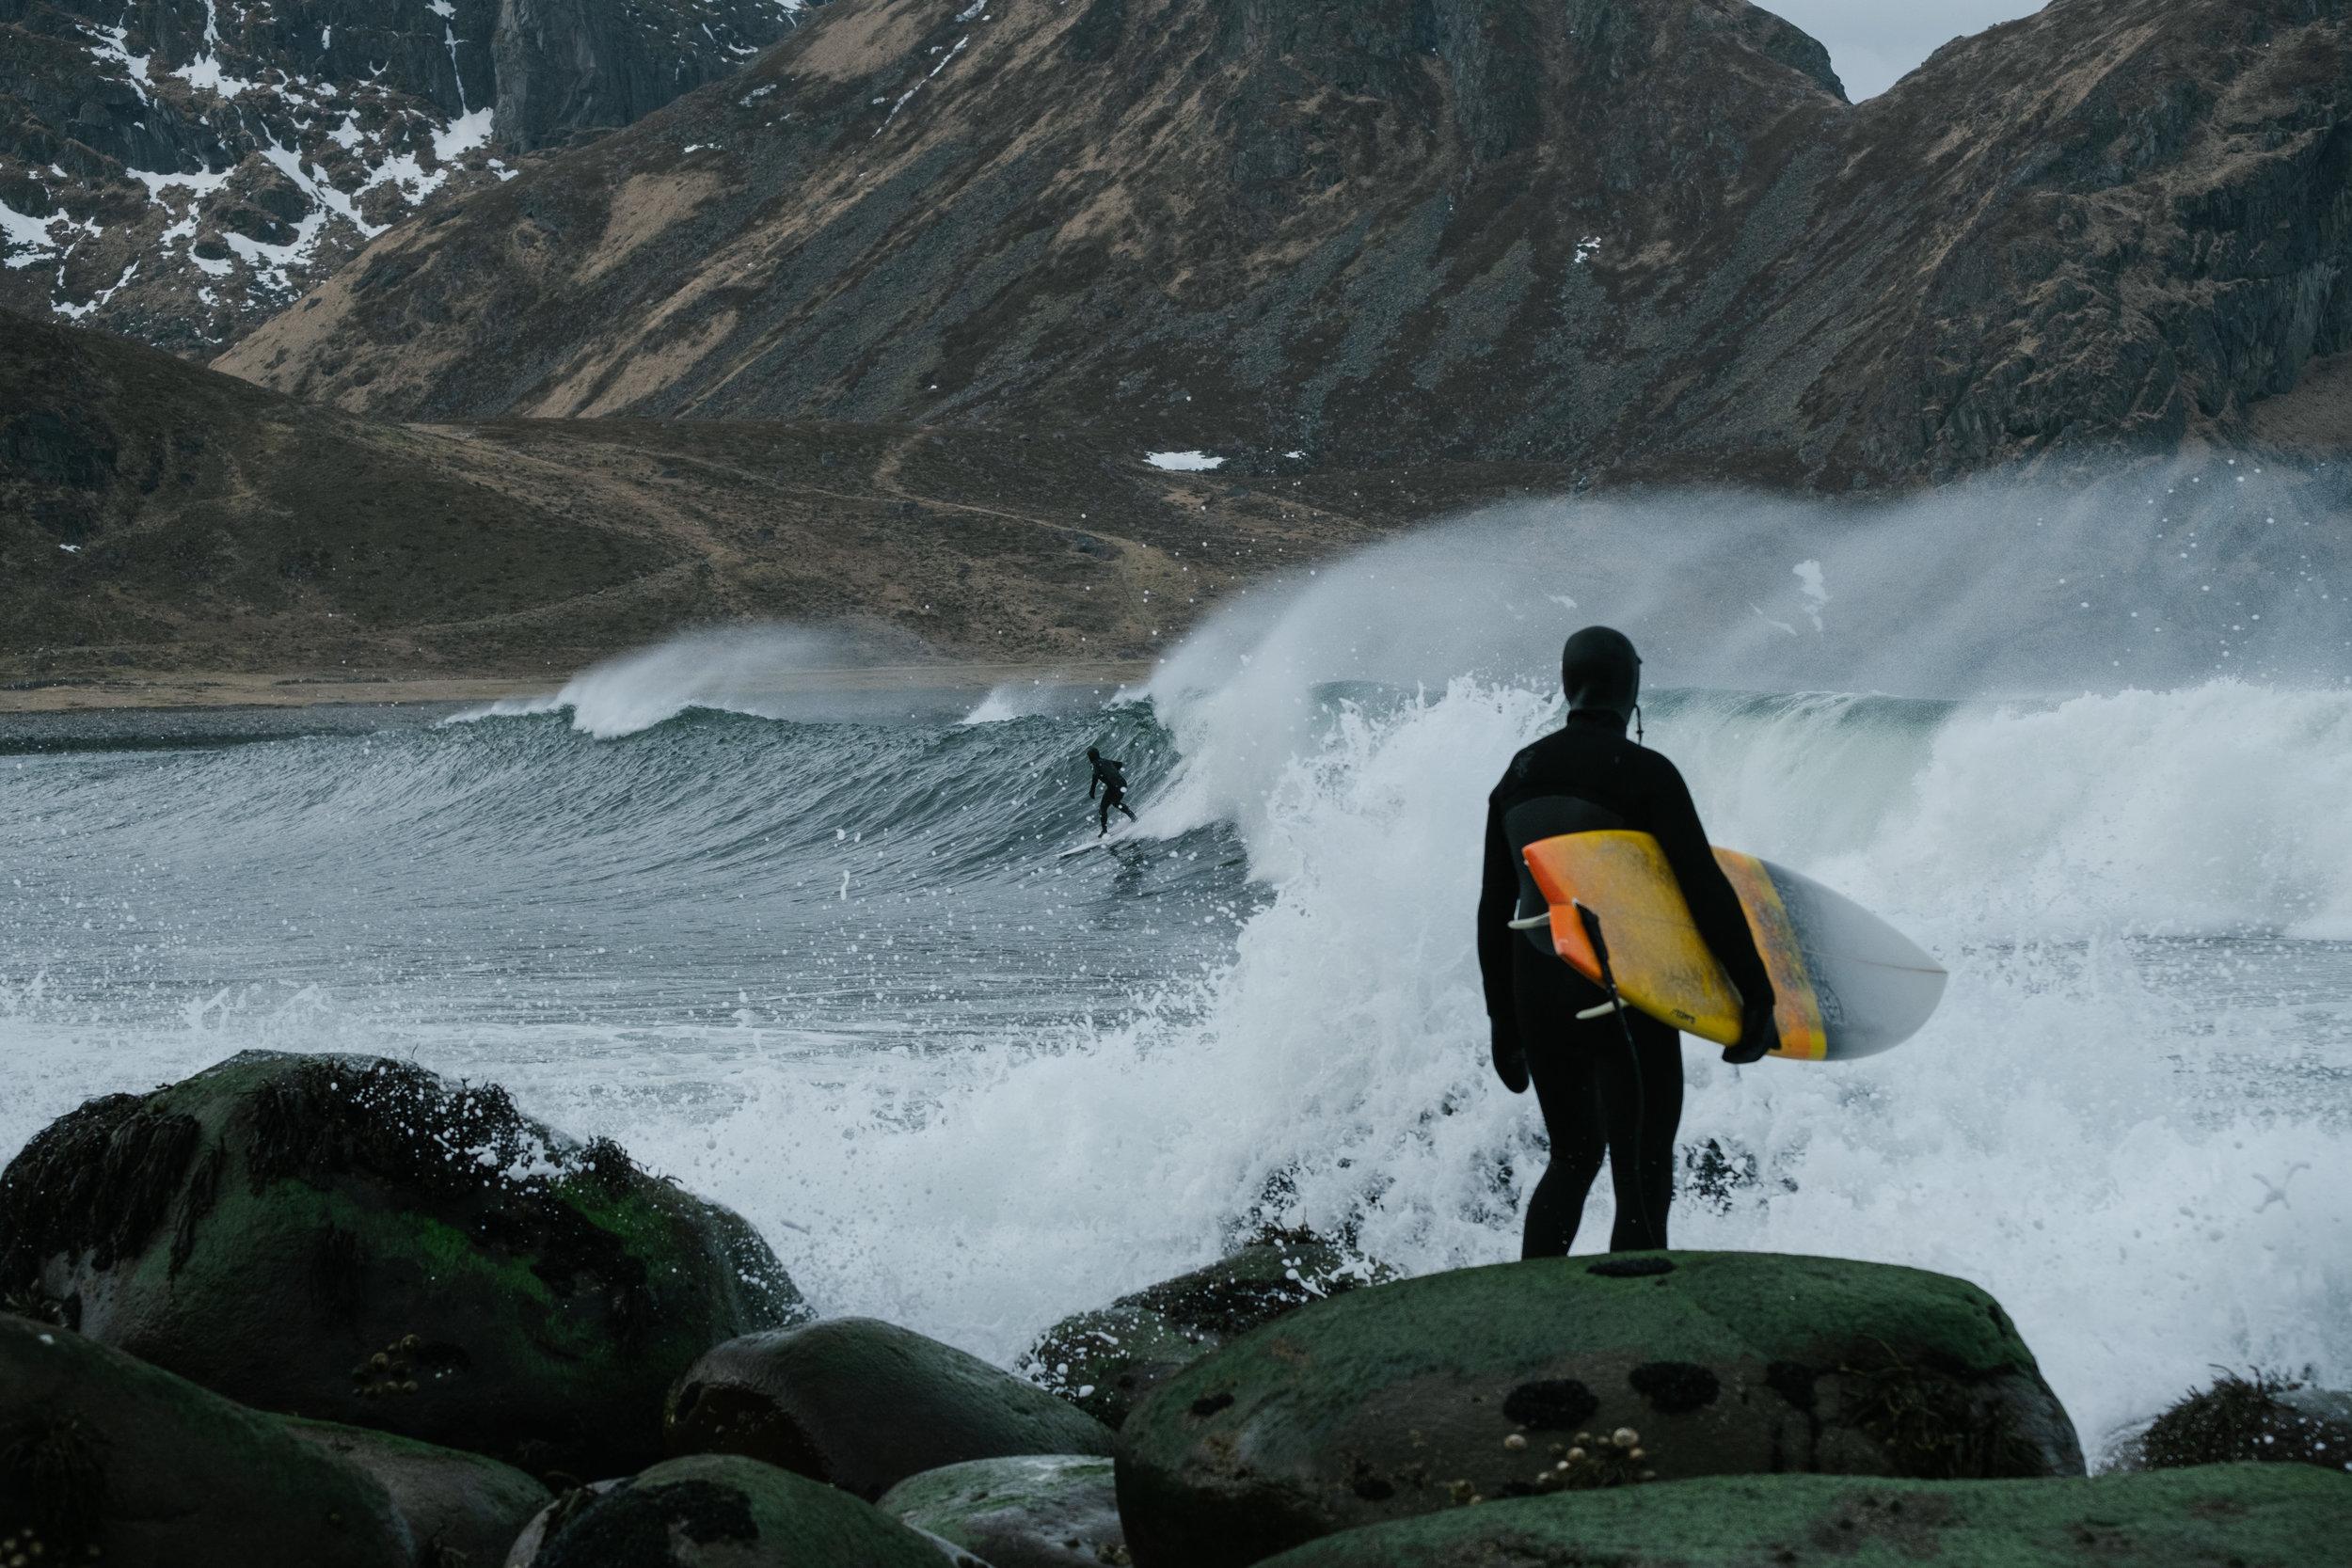 Arctic Surfing -